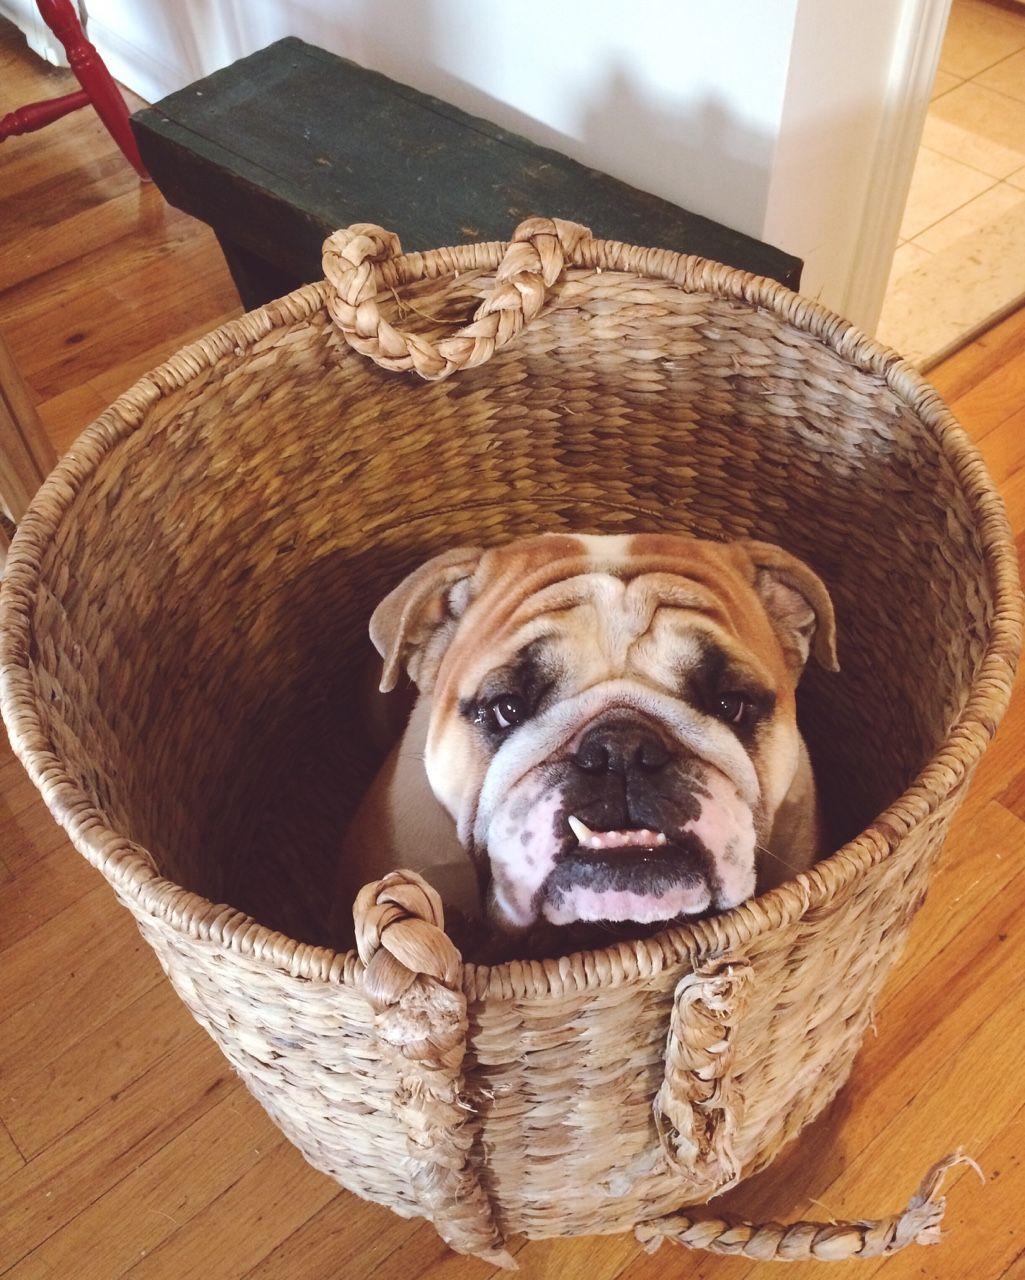 duncanthebulldog u201cnow how do i get out of here u201d dogs